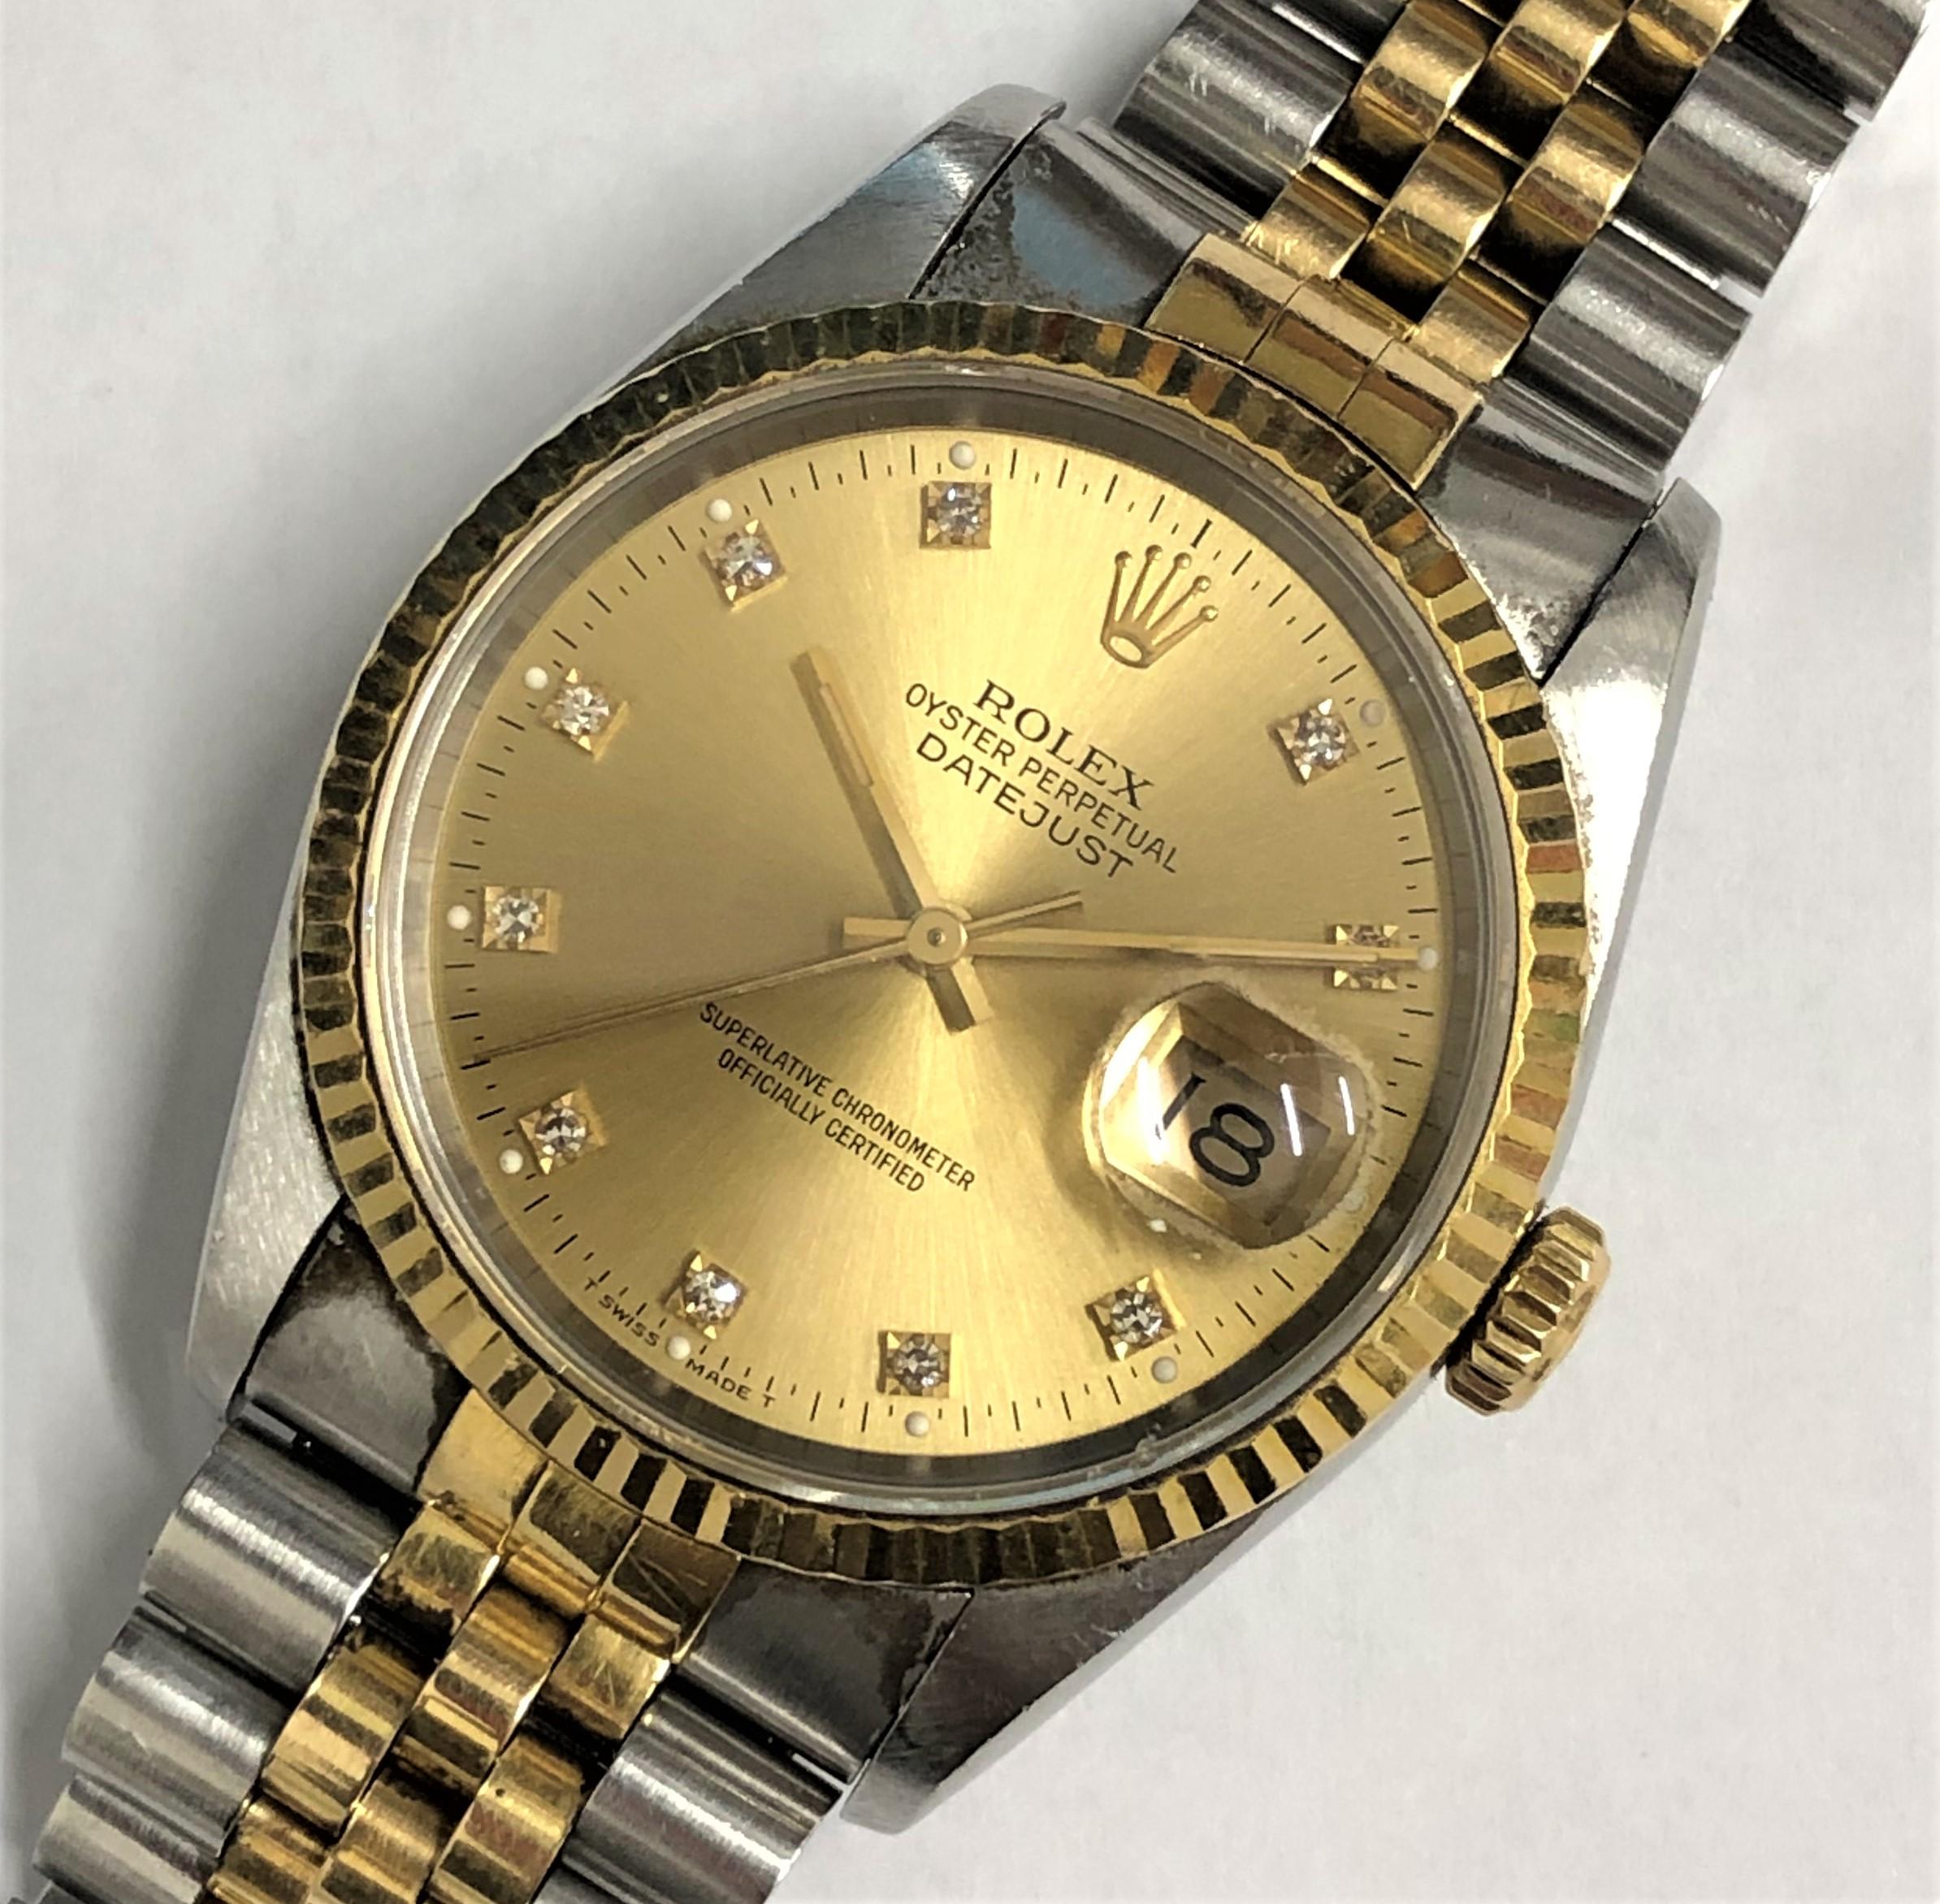 【ROLEX/ロレックス】デイトジャスト 10P 16233 X番 AT 腕時計